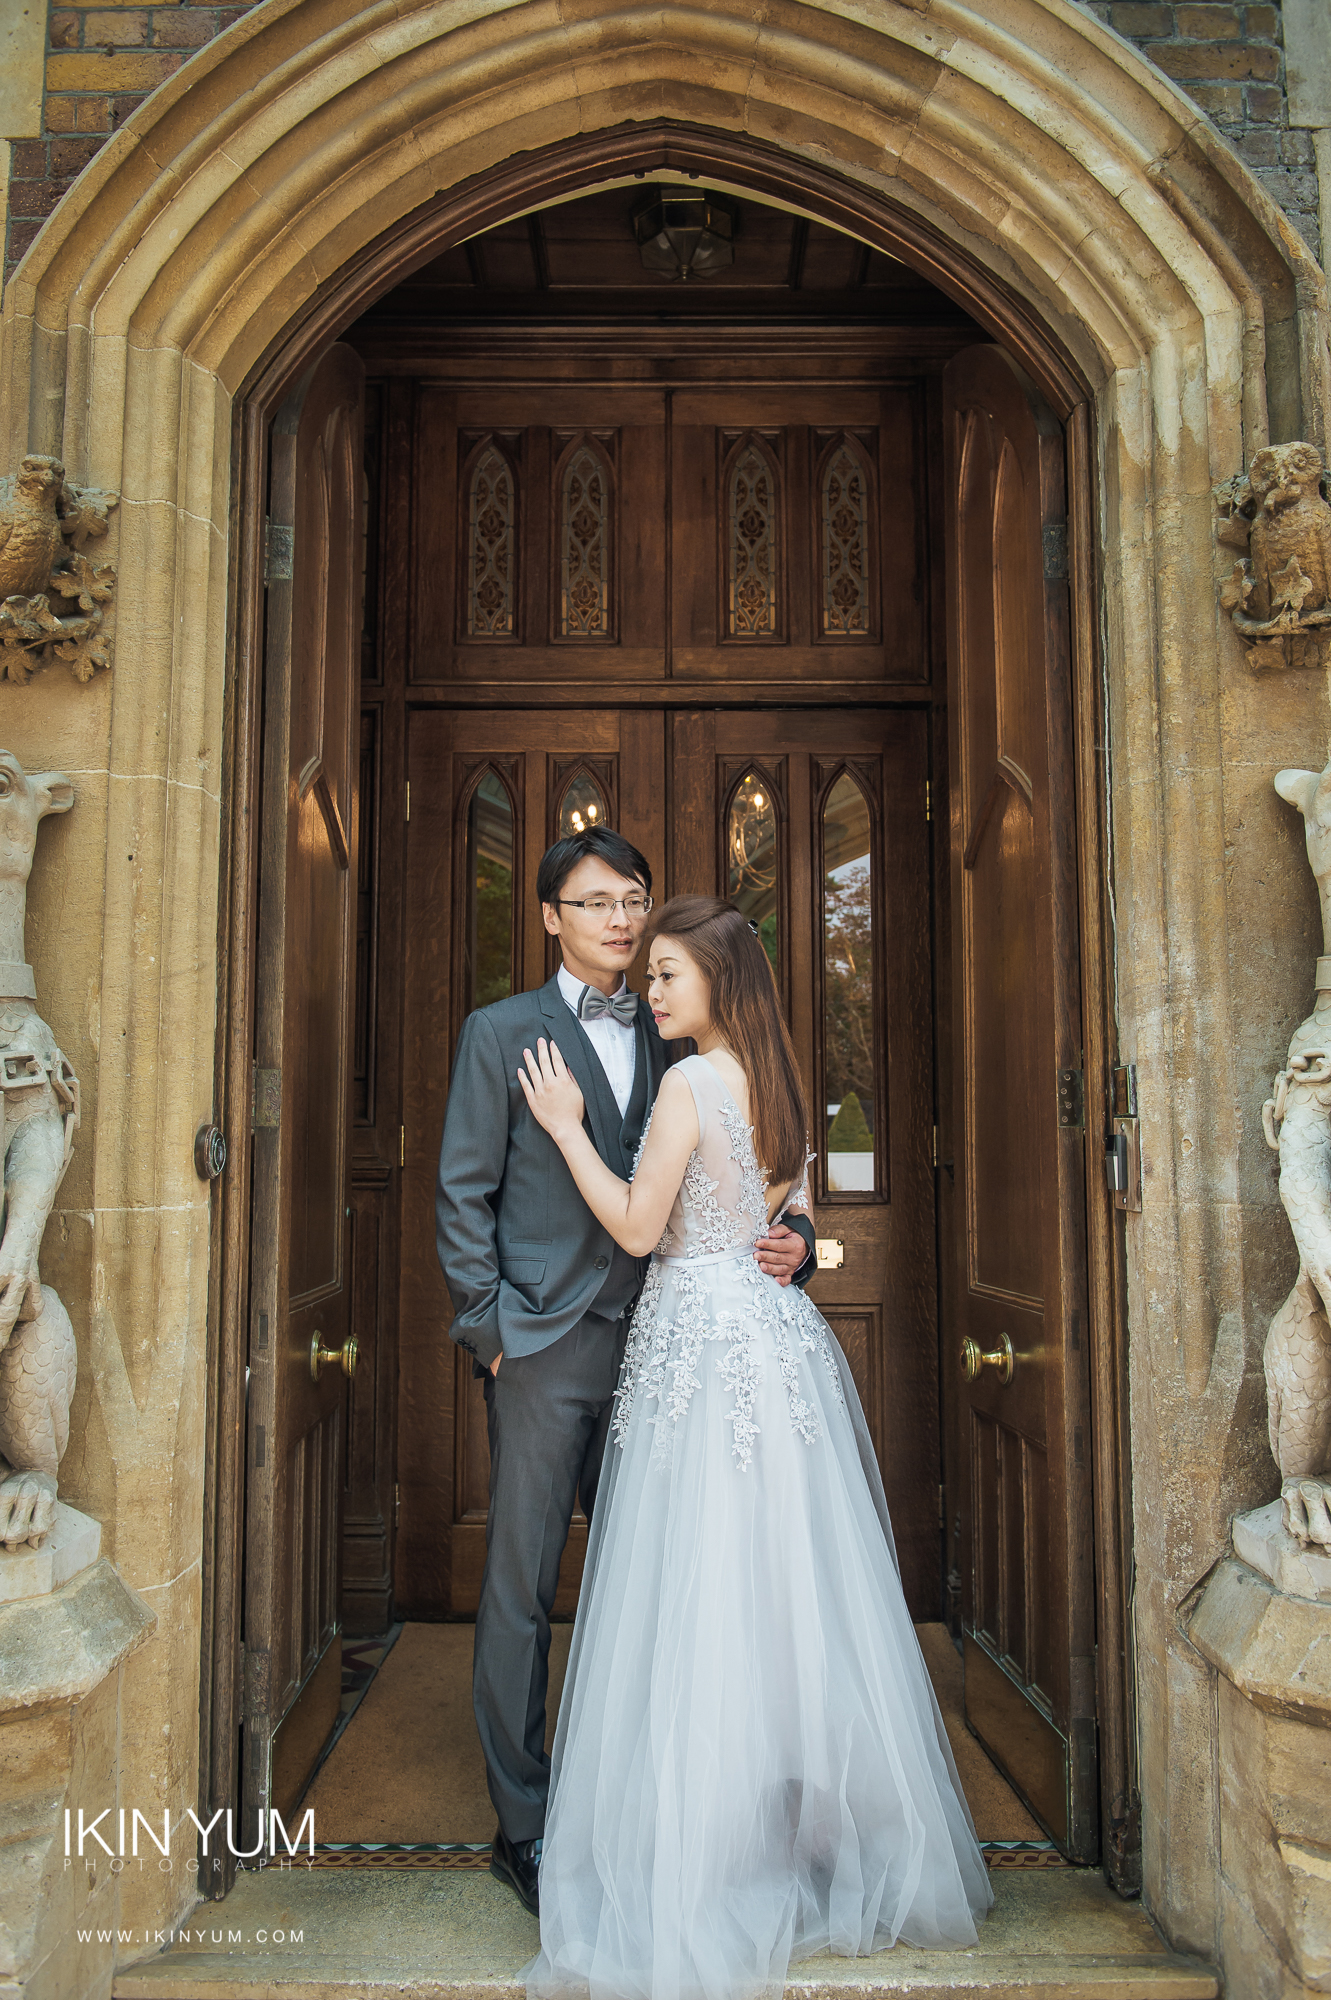 The oakley court Pre-Wedding Shoot - Ikin Yum Photography-060.jpg